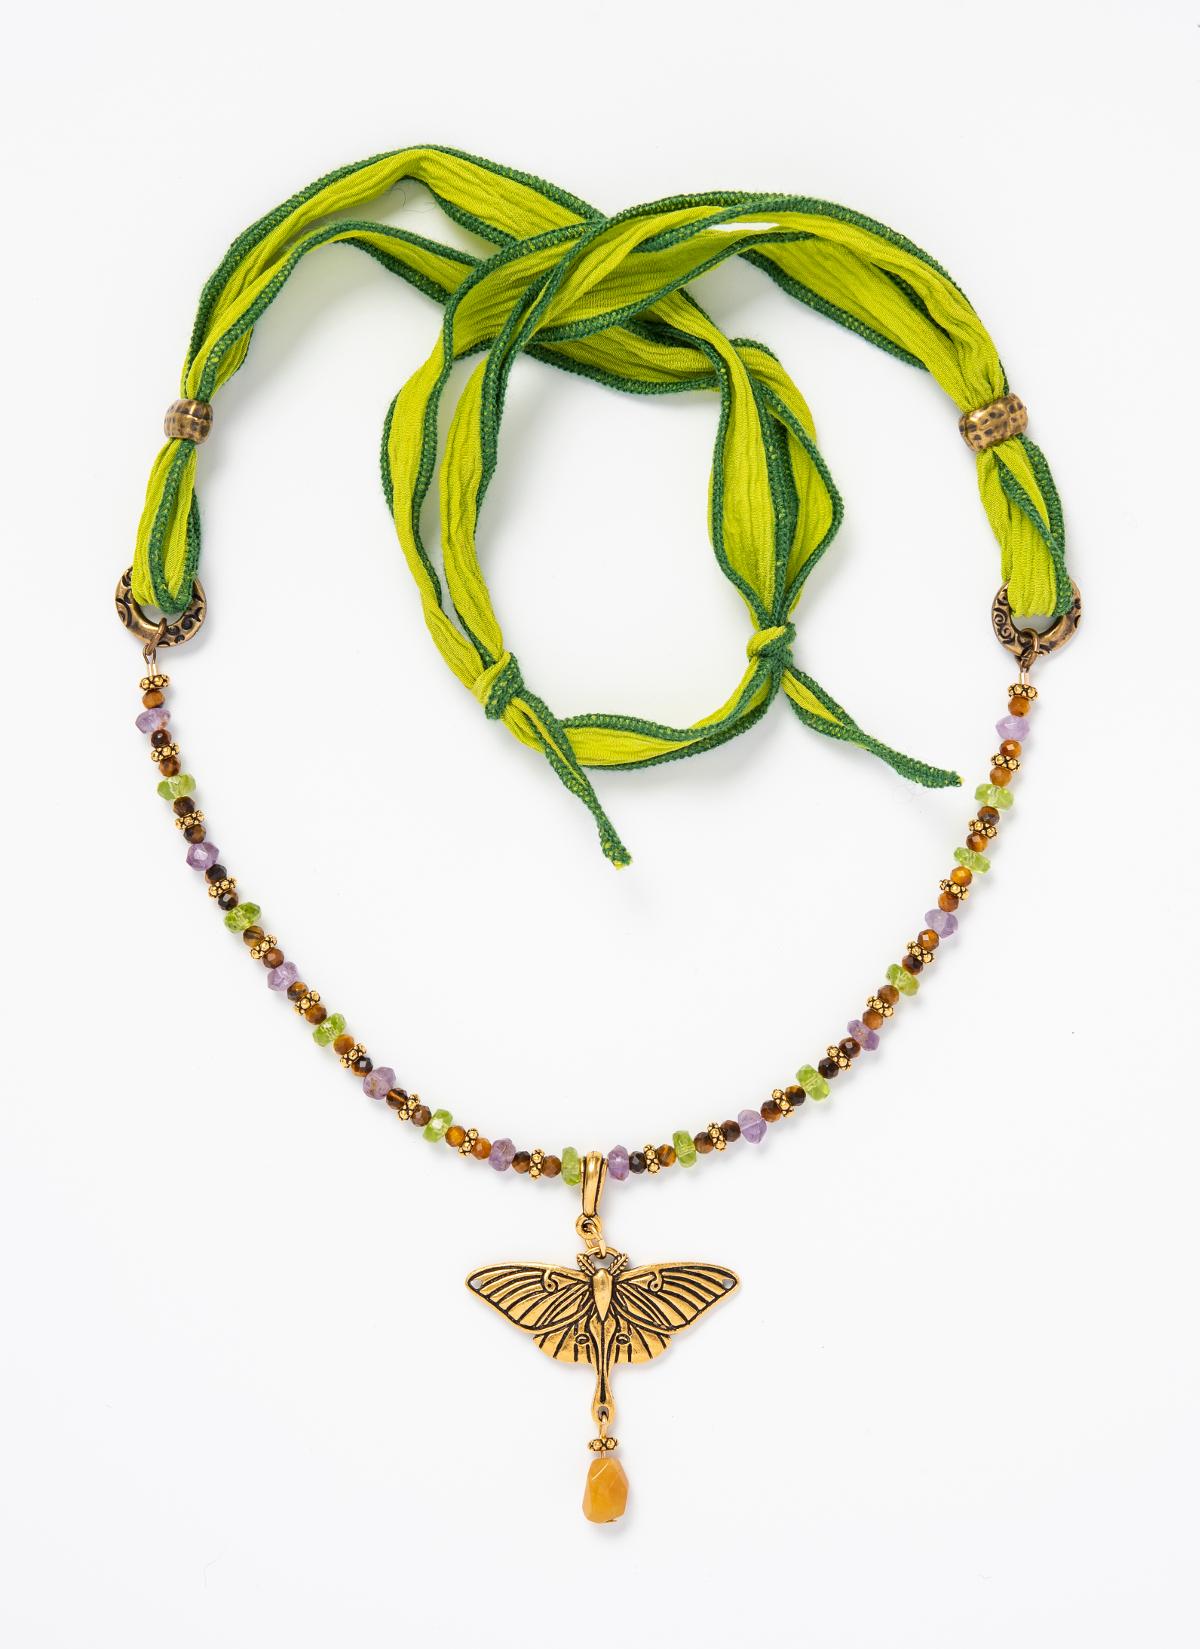 luna-moth-necklace-onwhite-1200px.jpg